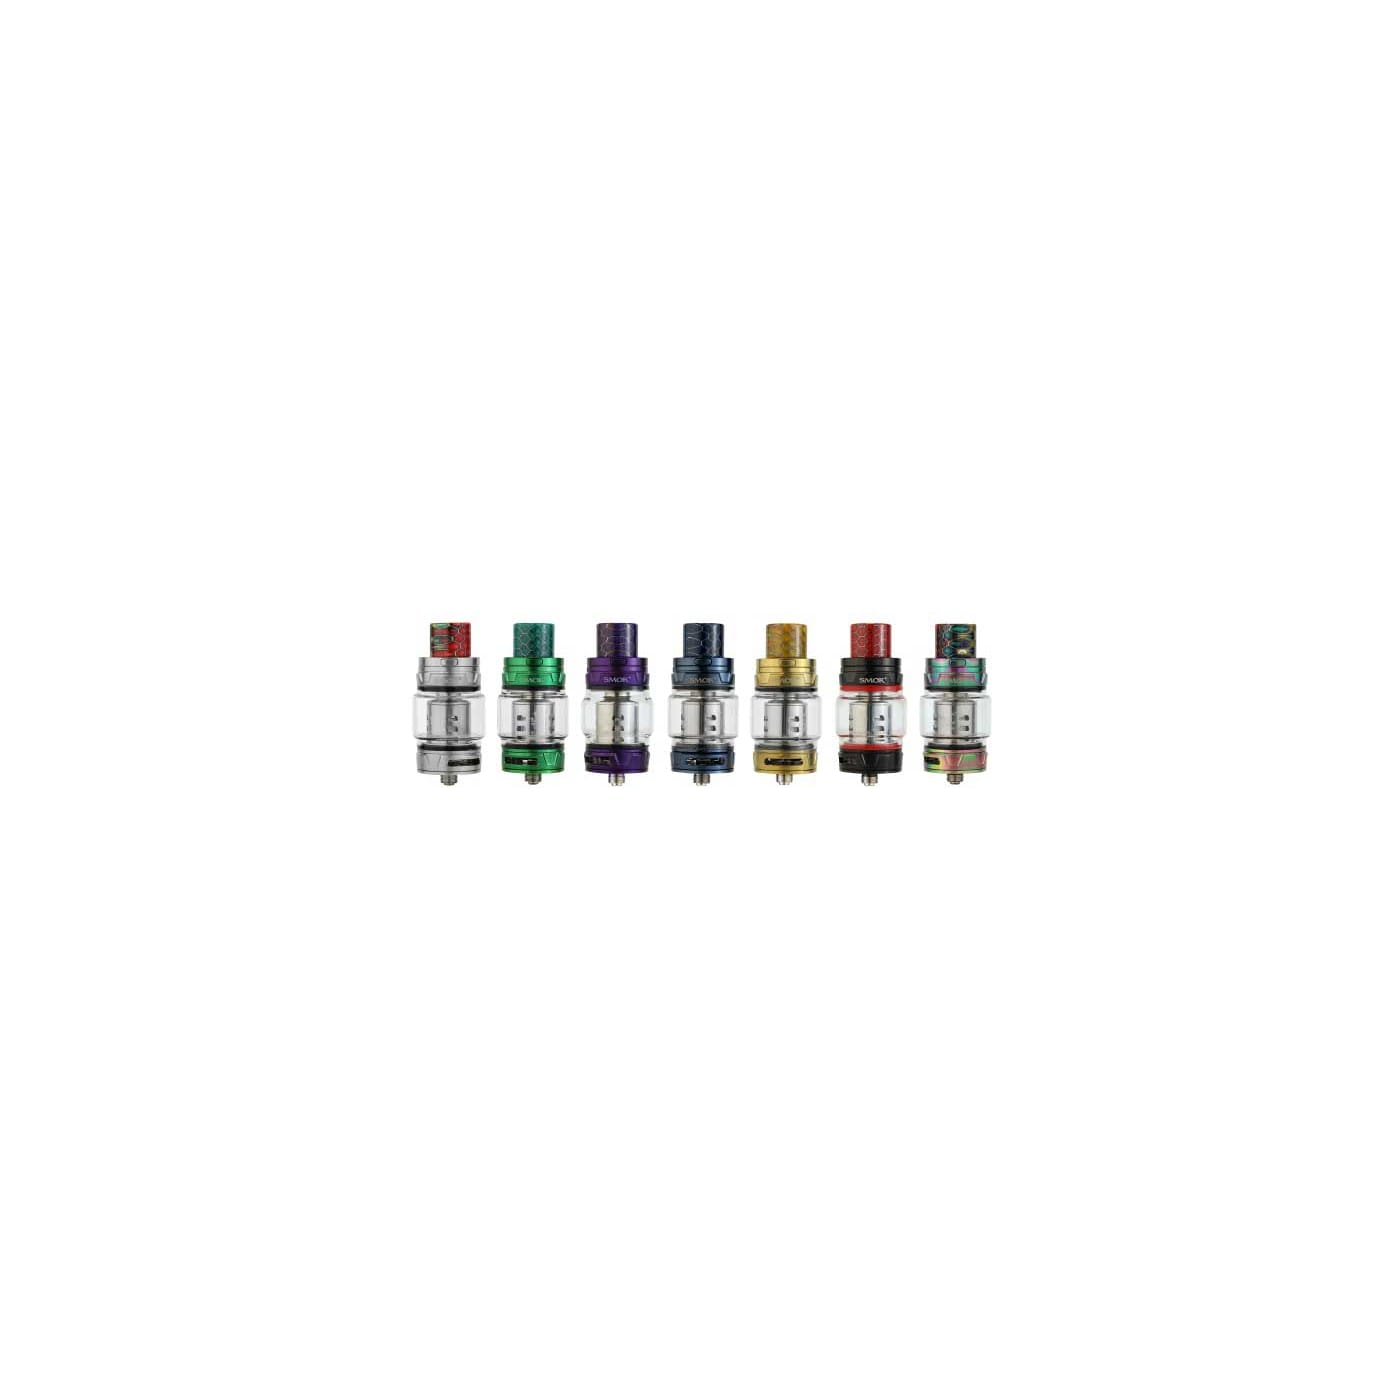 Smok TFV12 Prince Tank Cobra Drip Tip Edition Colors